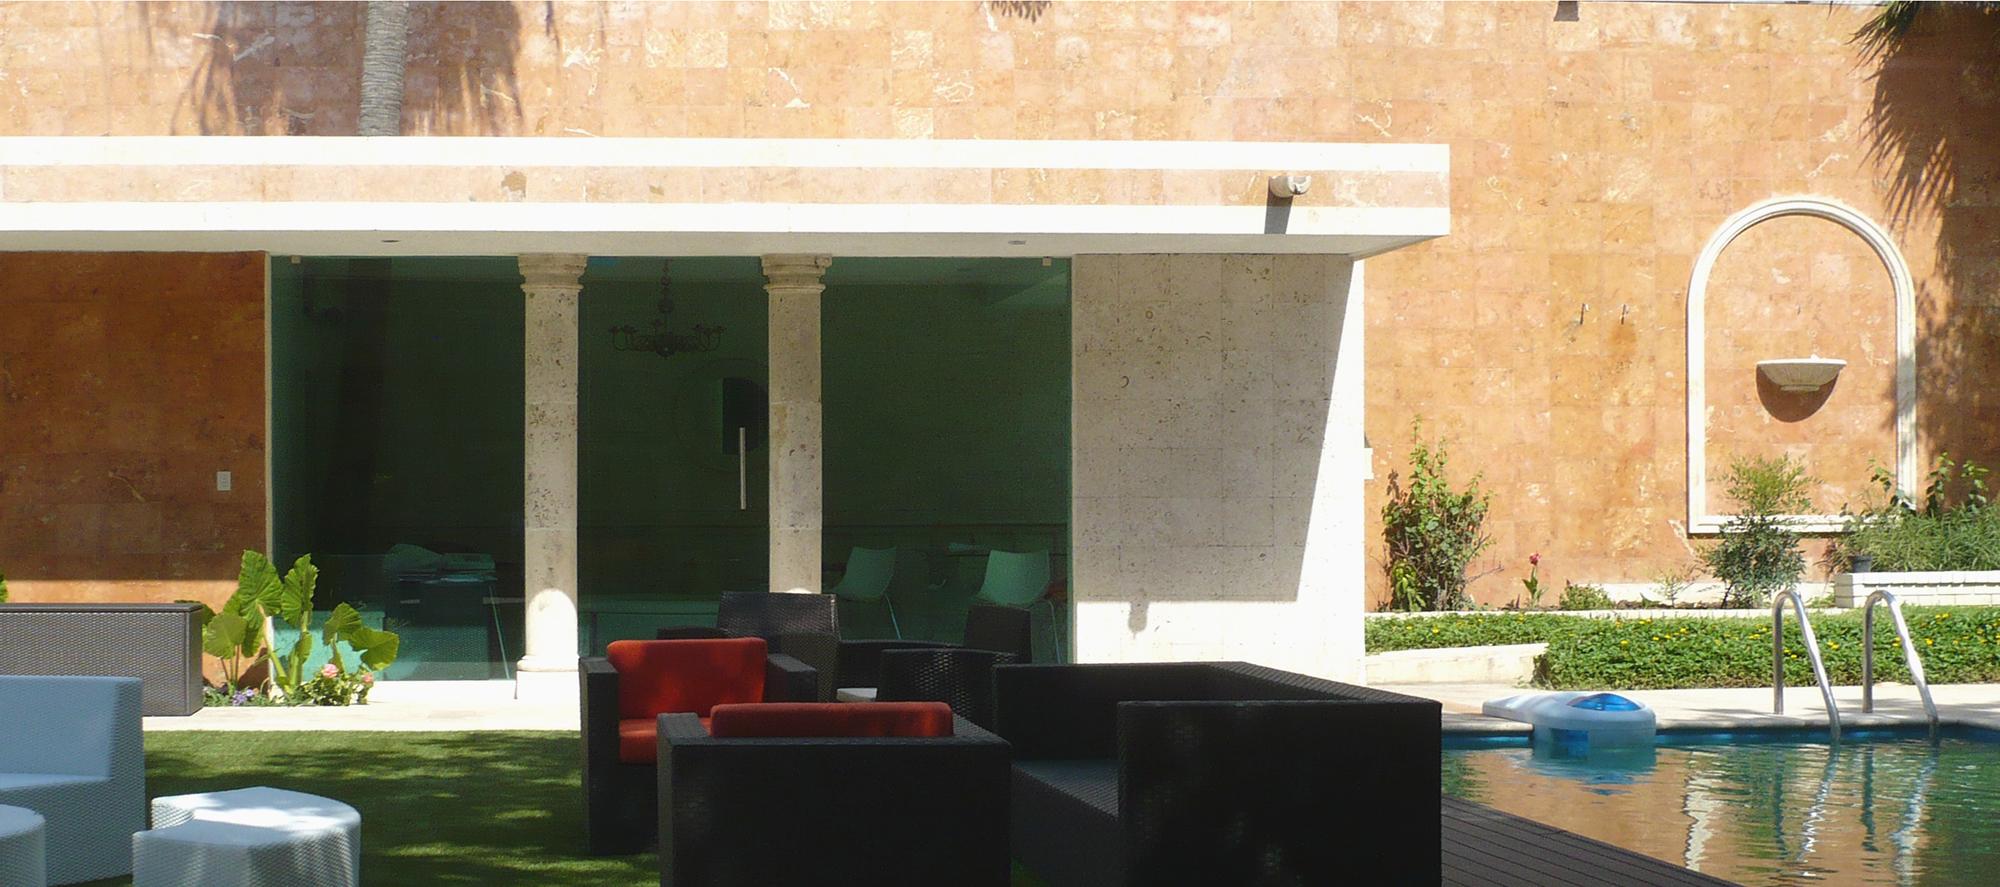 Uxmal_Galleria pool & pool house & wall_2000x887_P1070591.jpg